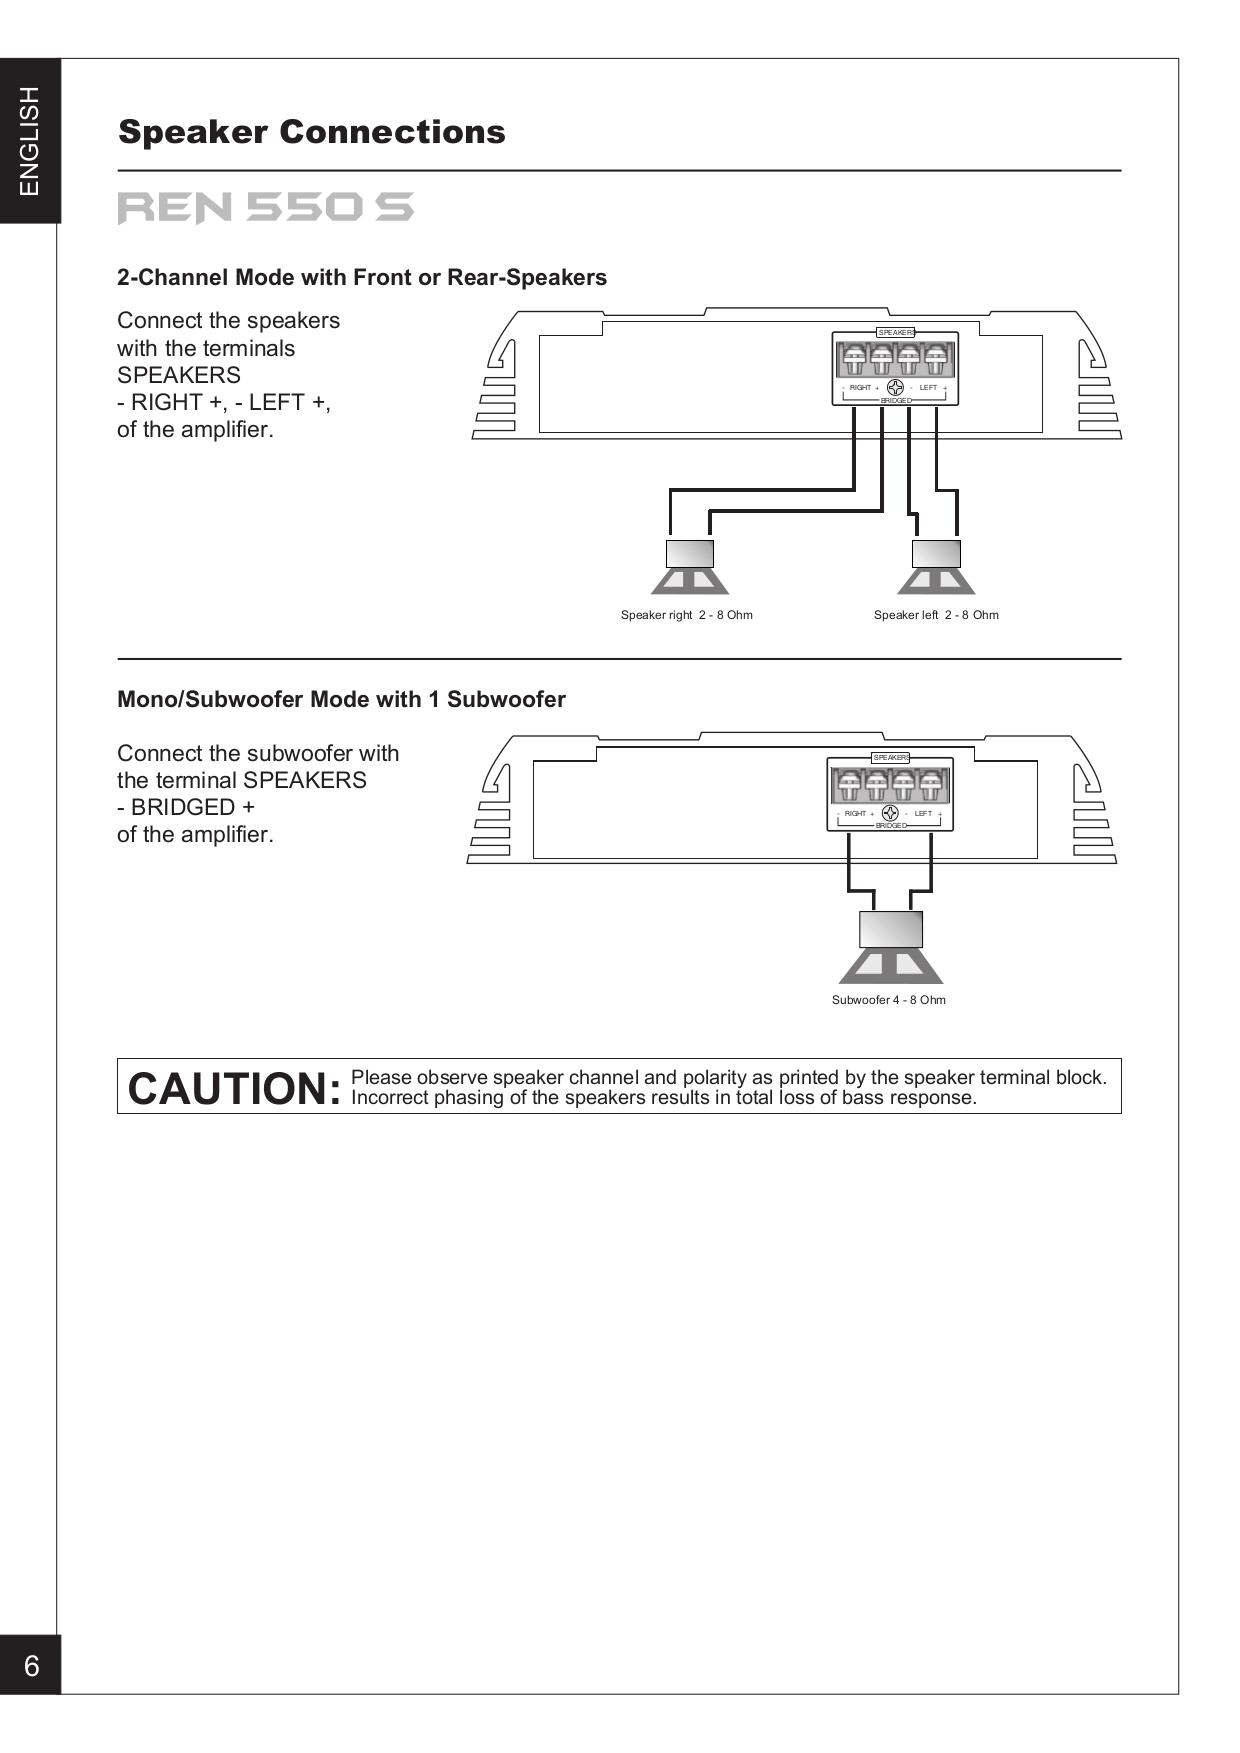 pdf manual for renegade car amplifier ren 550 s rh umlib com Renegade Amp Kit Renegade Car Audio